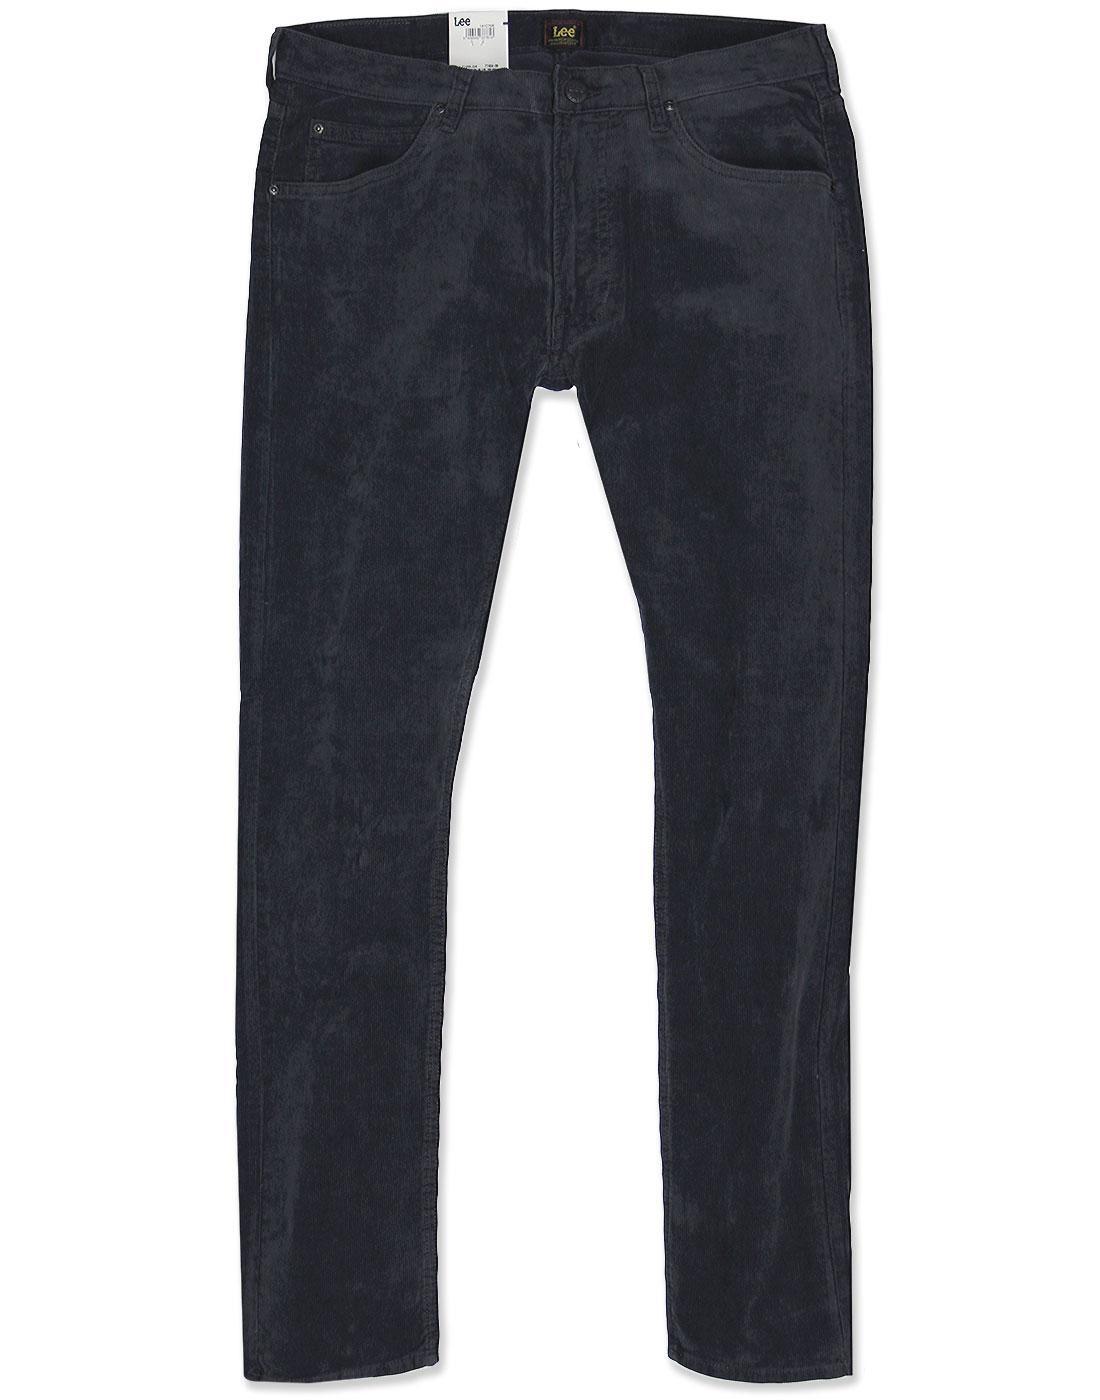 Luke LEE Retro Mod Slim Tapered Cord Jeans GREY